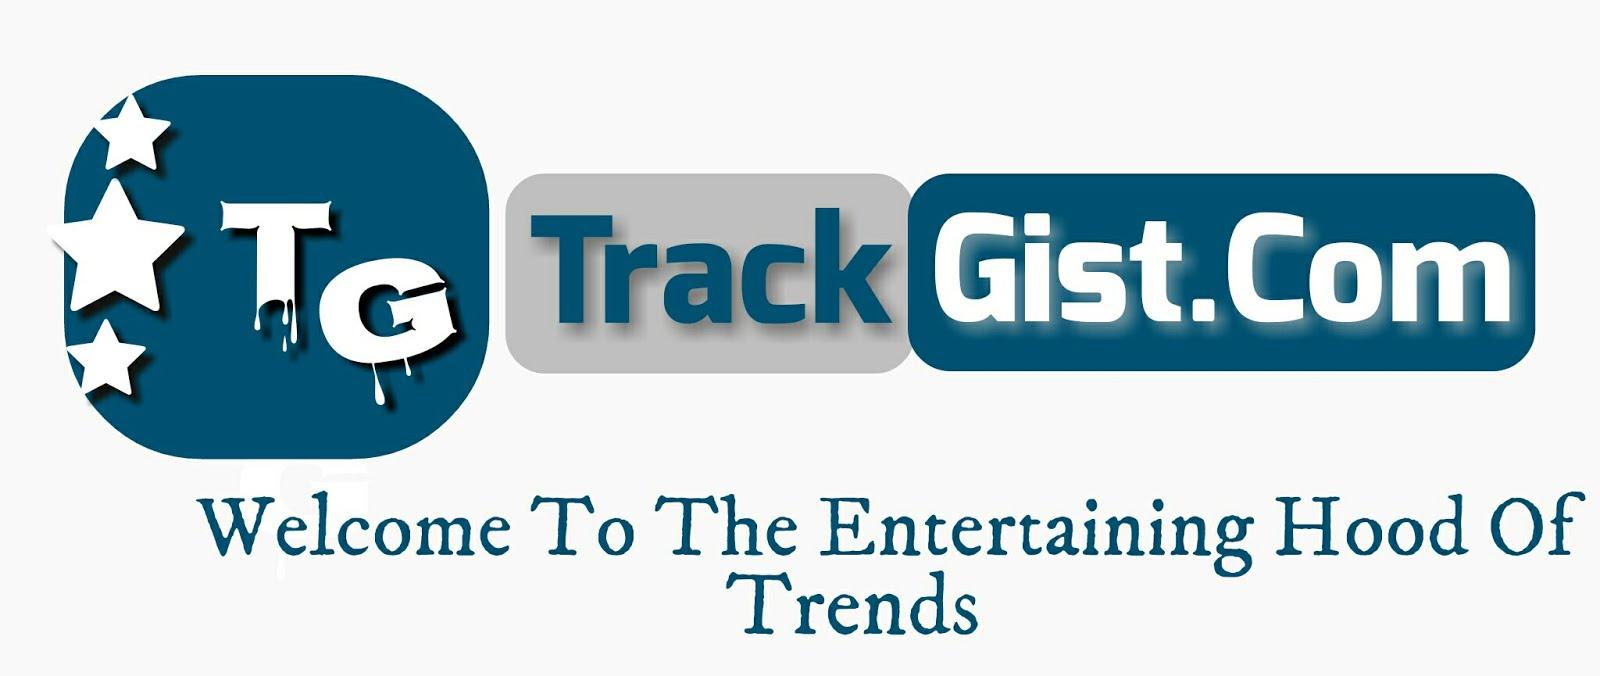 Trackgist